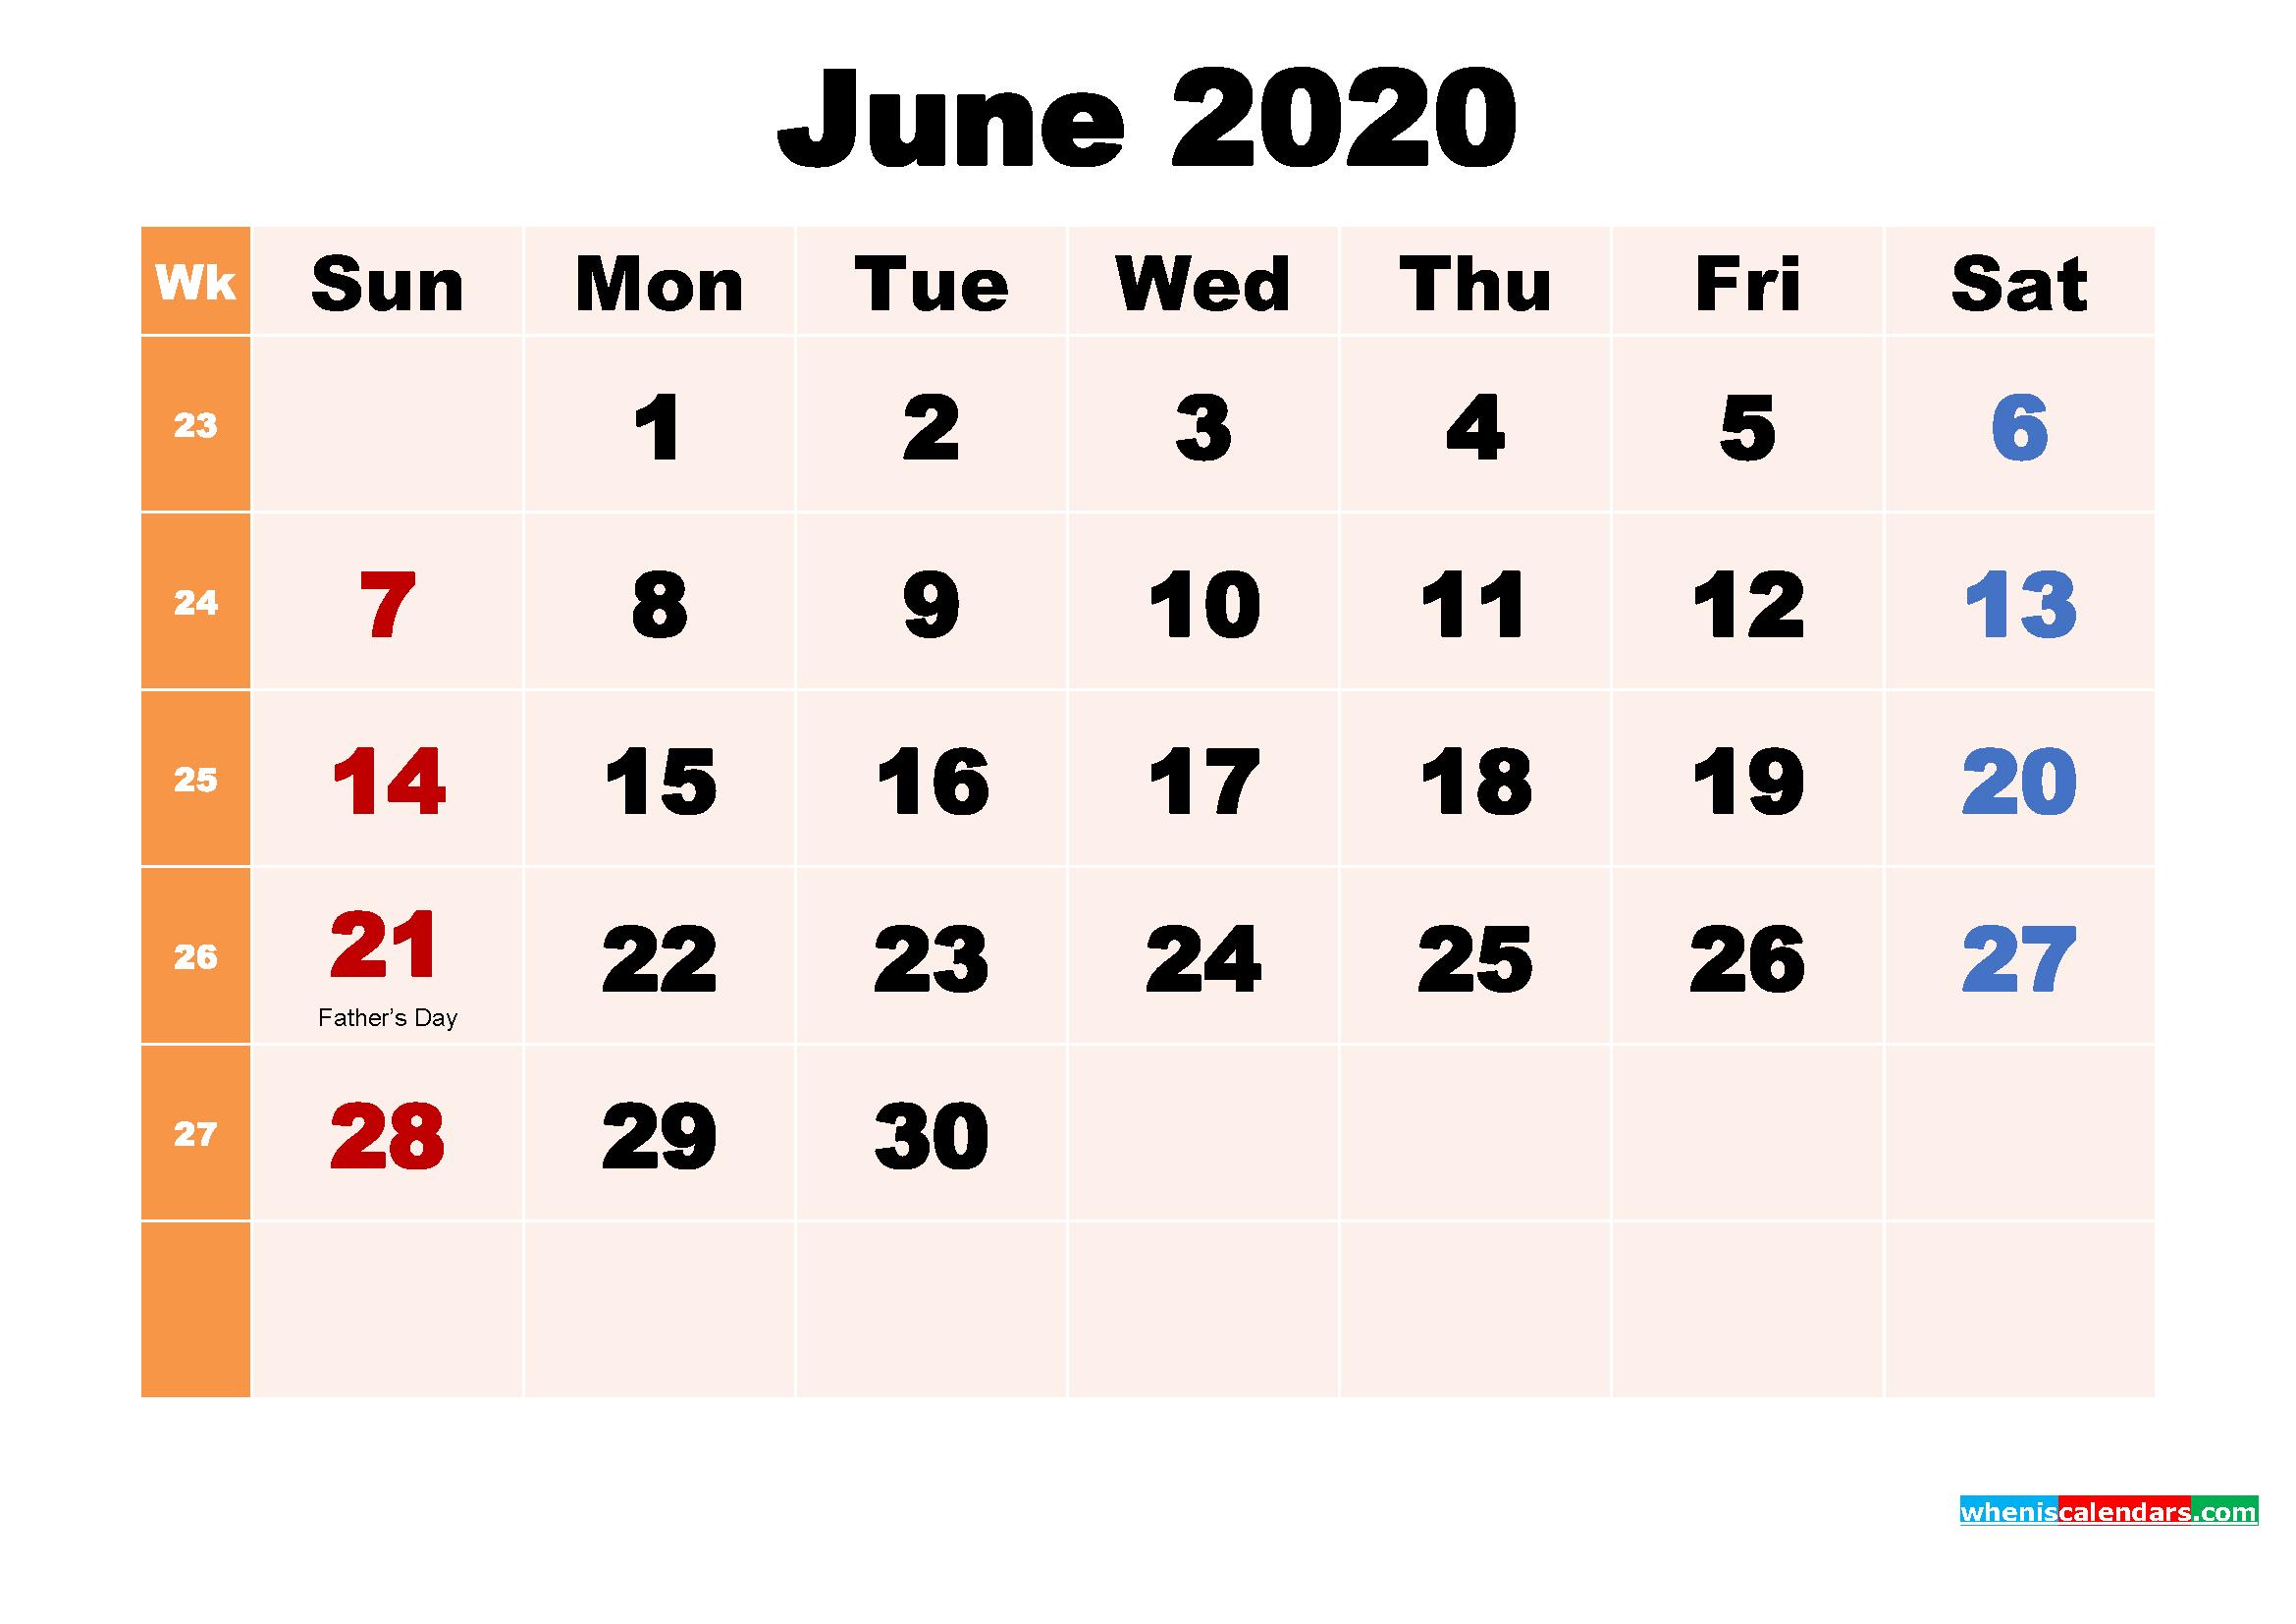 June 2020 Desktop Calendar with Holidays